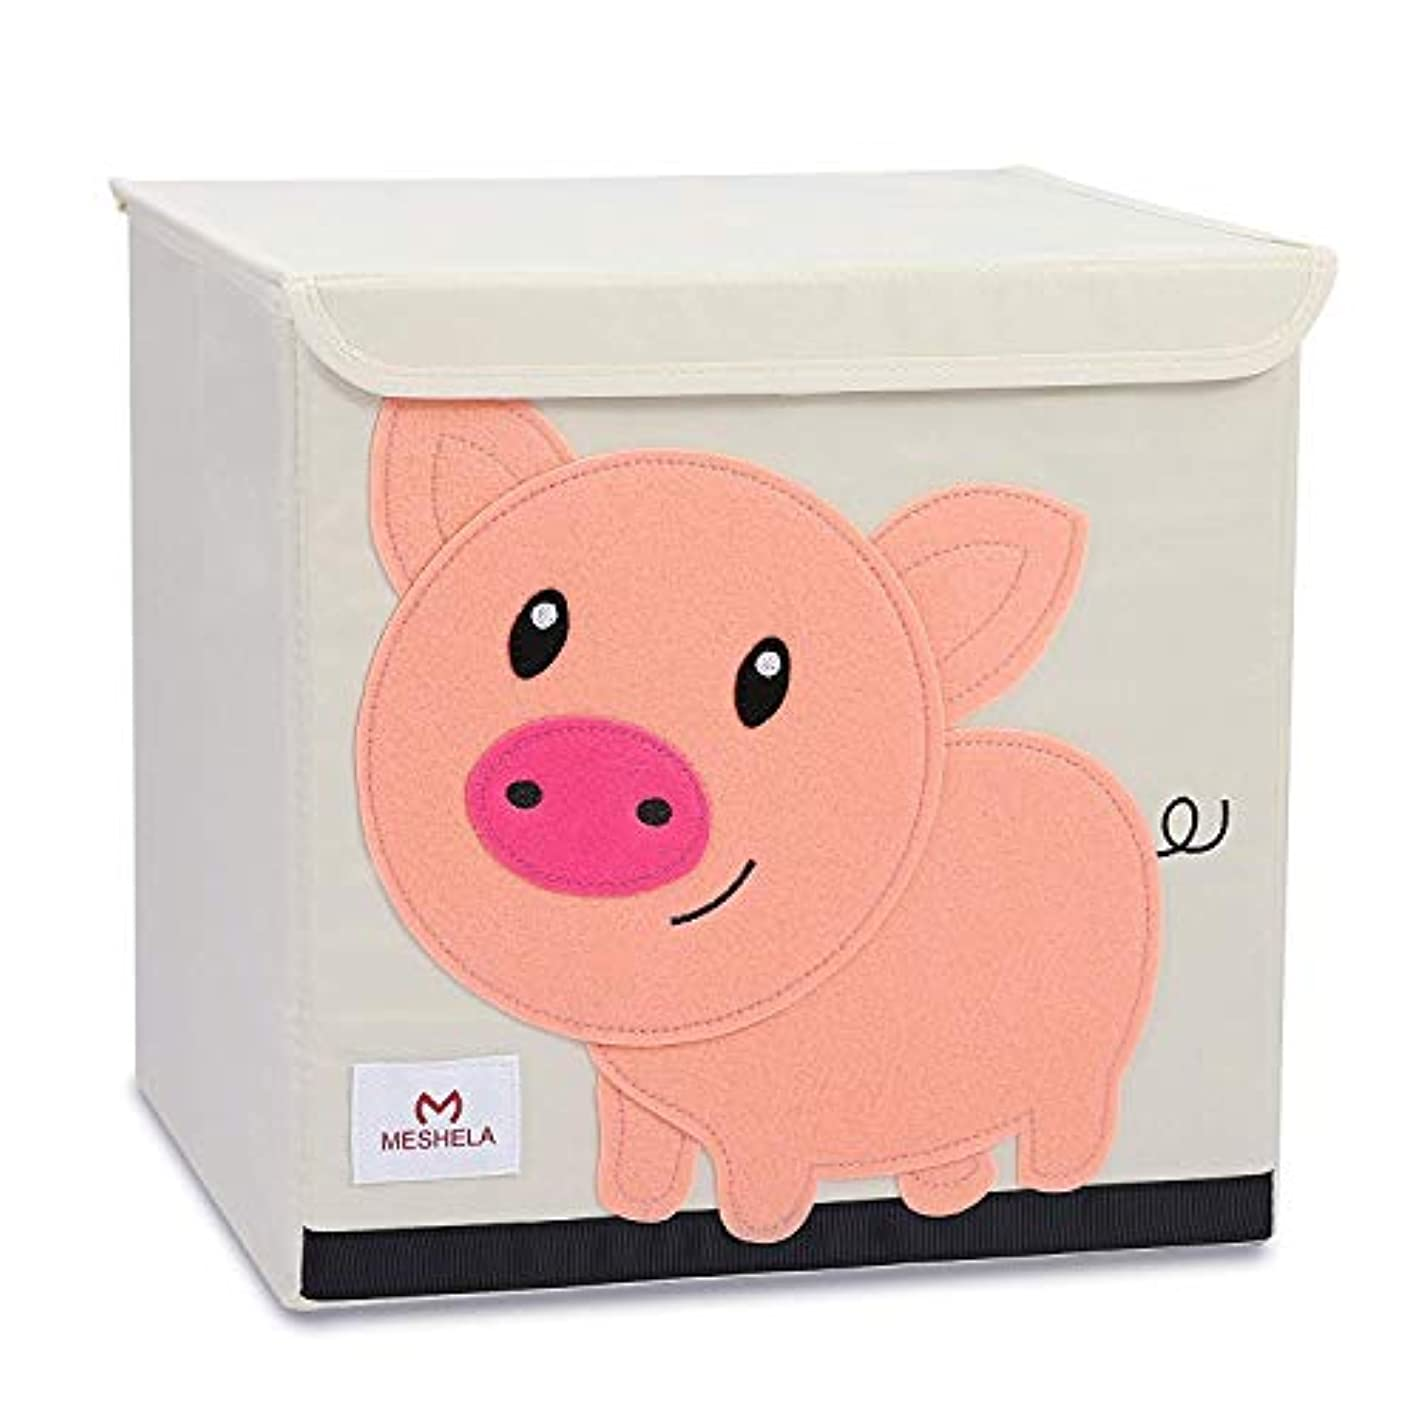 Pasutewel Kids Storage Box, Large Capacity Foldable Cartoon Canvas Cube Organiser For Clothes, Shoes, Toys (Pig)